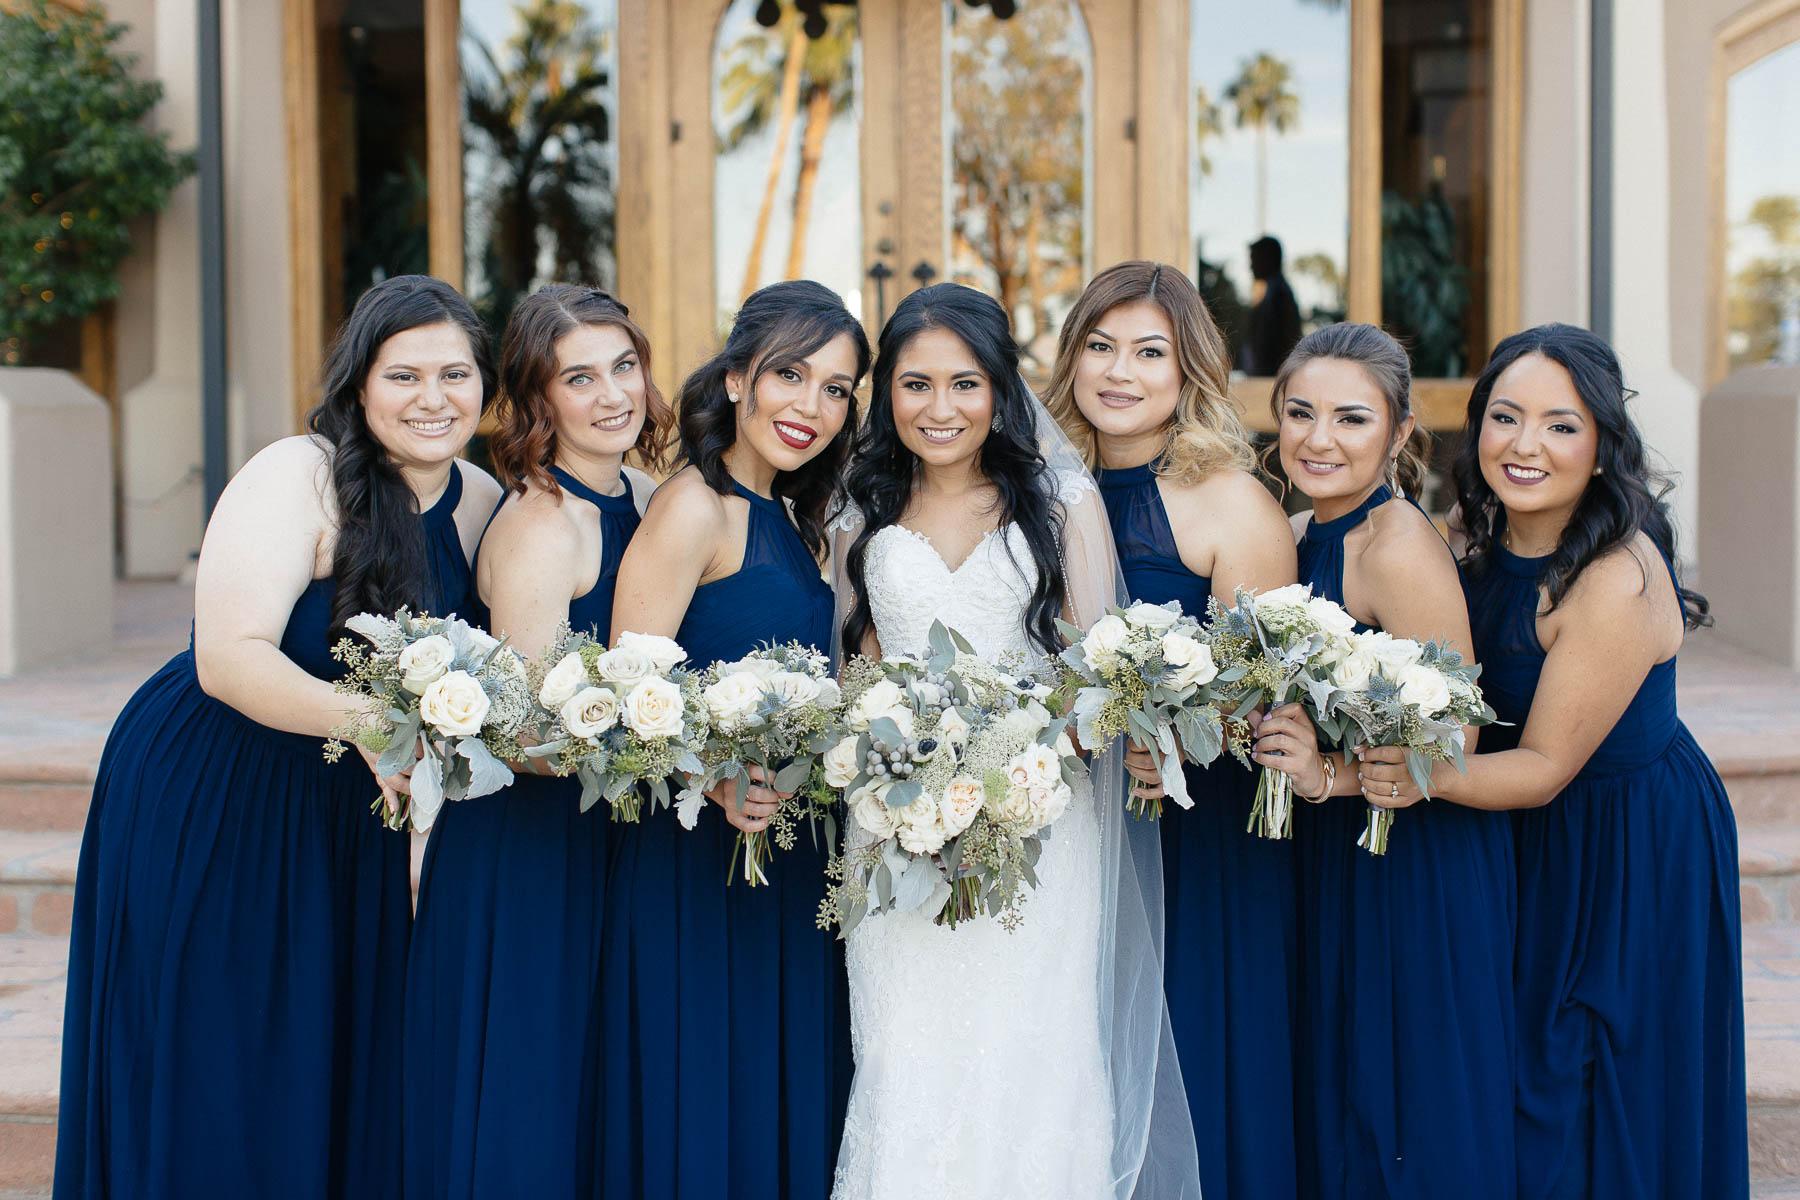 161029-Luxium-Weddings-Arizona-Jeff-Griselda-First-Look-Val-Vista-Lakes-Gilber-047.jpg